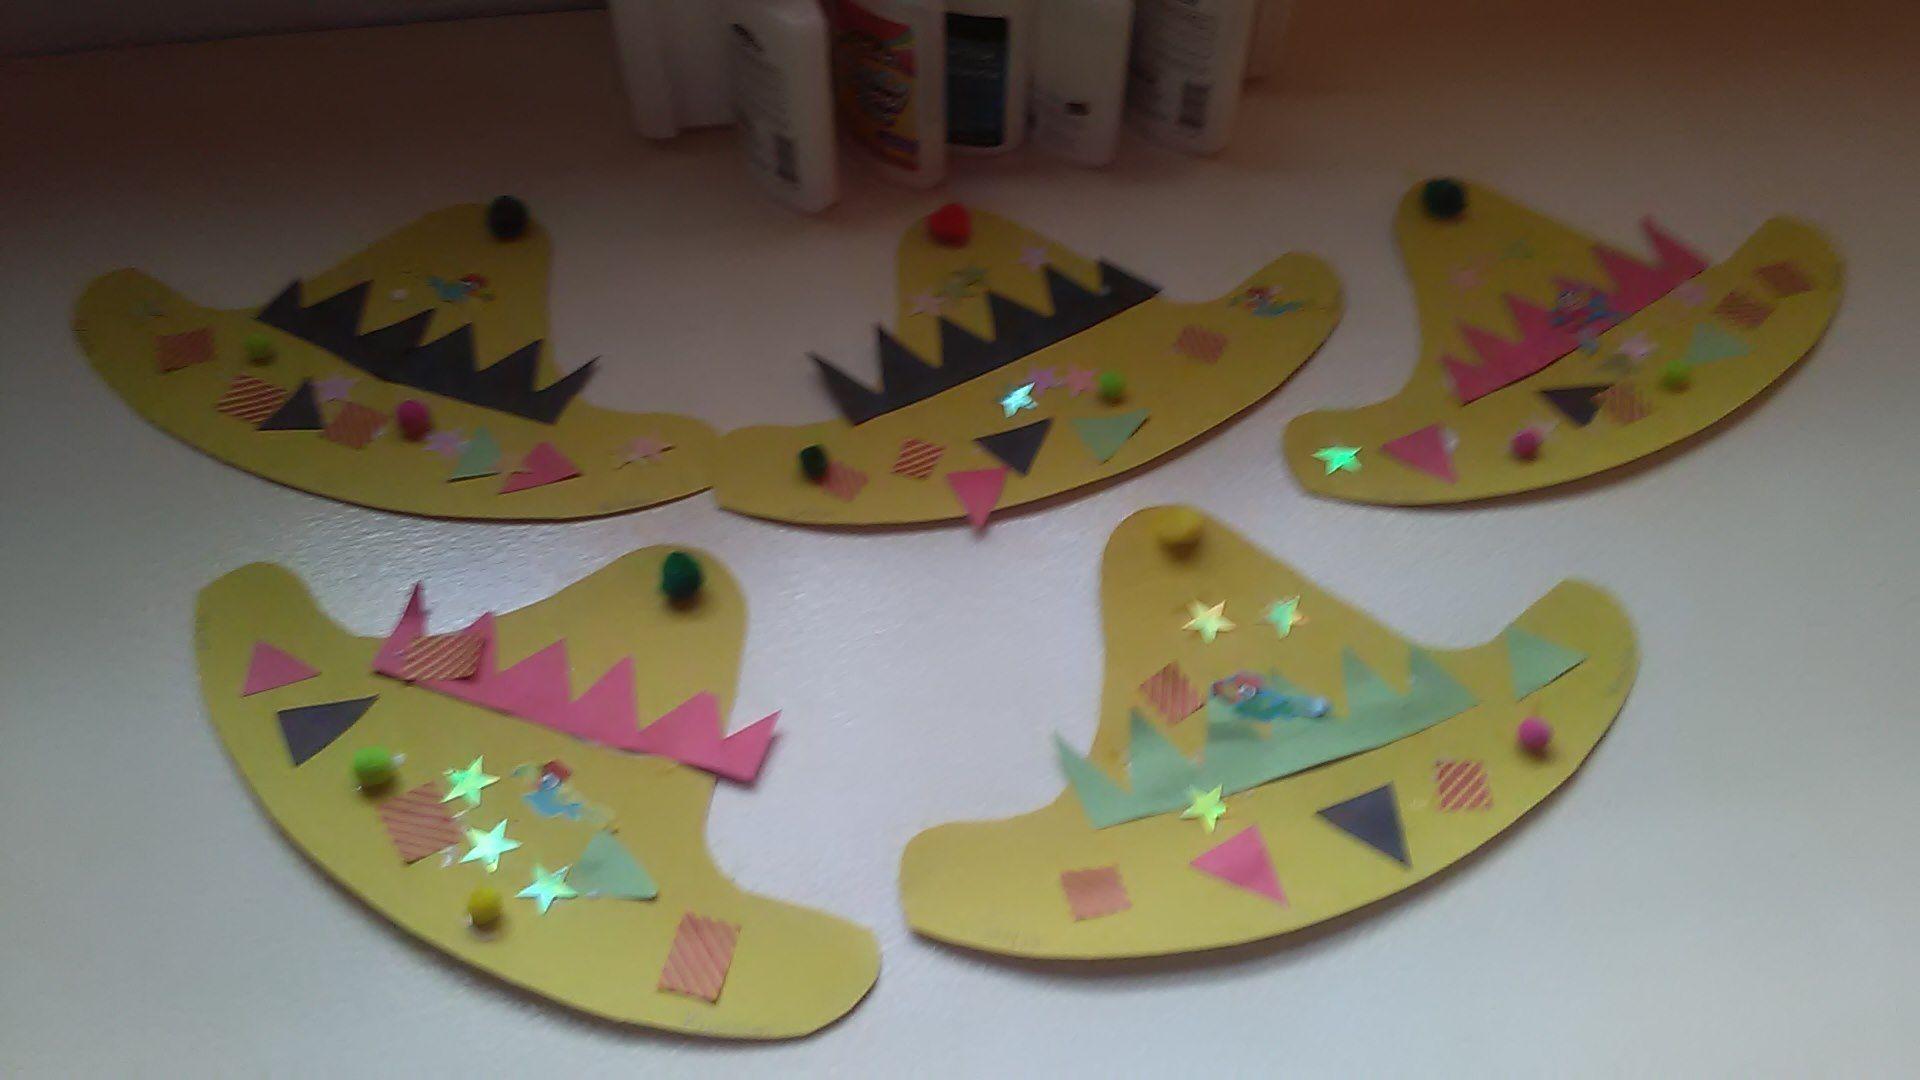 The Children Enjoyed Decorating Their Cinco De Mayo